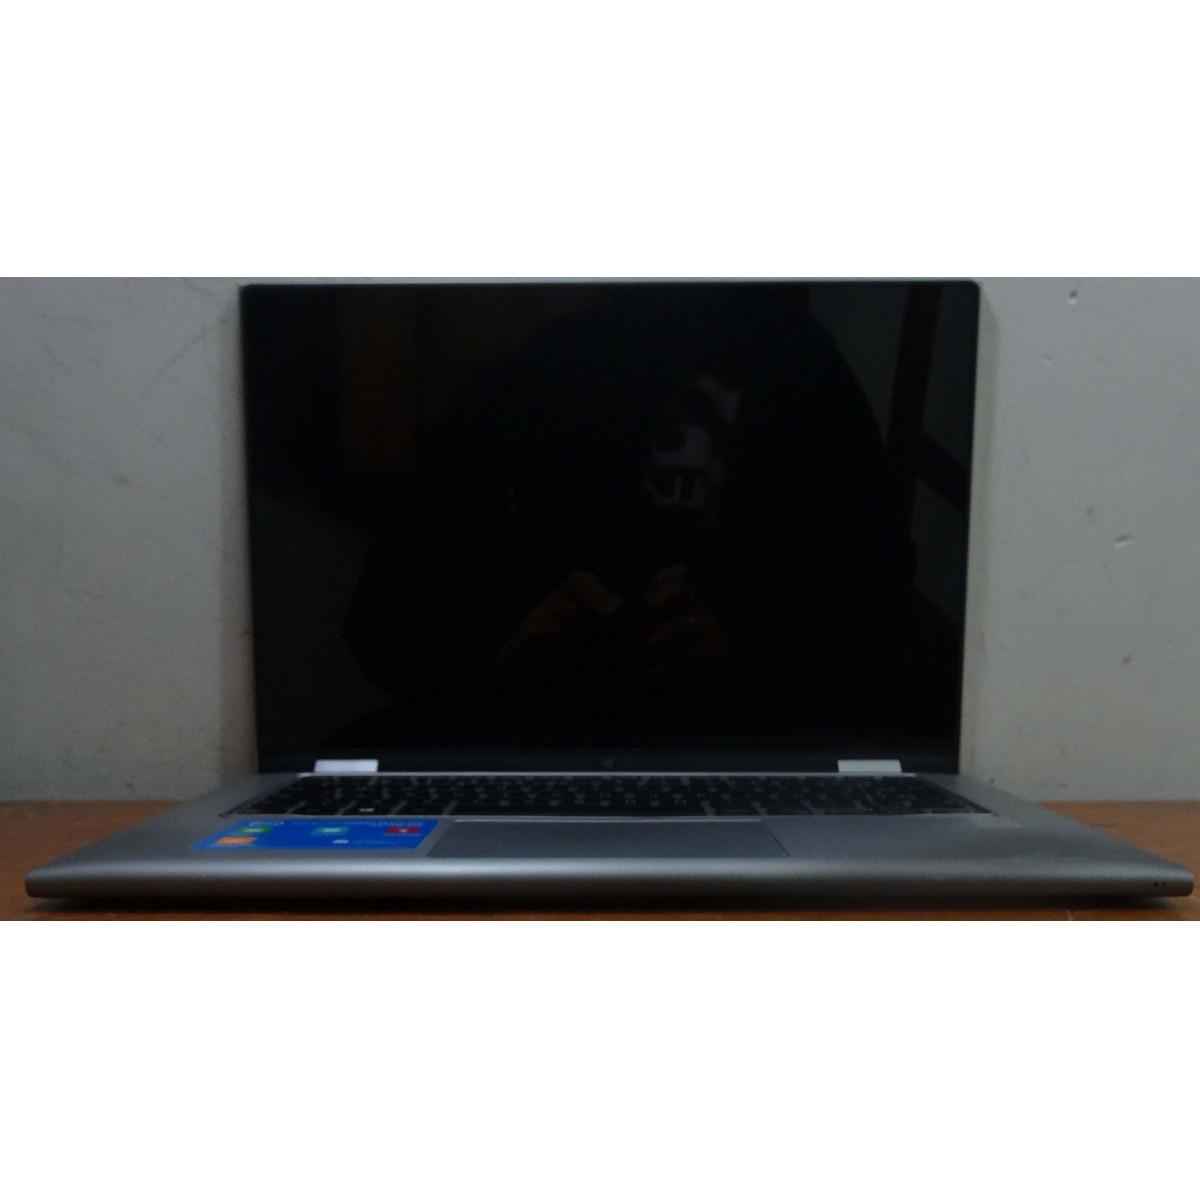 Notebook 2 em 1 Dell 13-7348-B20 13.3'' Intel Core i5 2.2GHz 4GB HD-500 TOUCHSCREEN